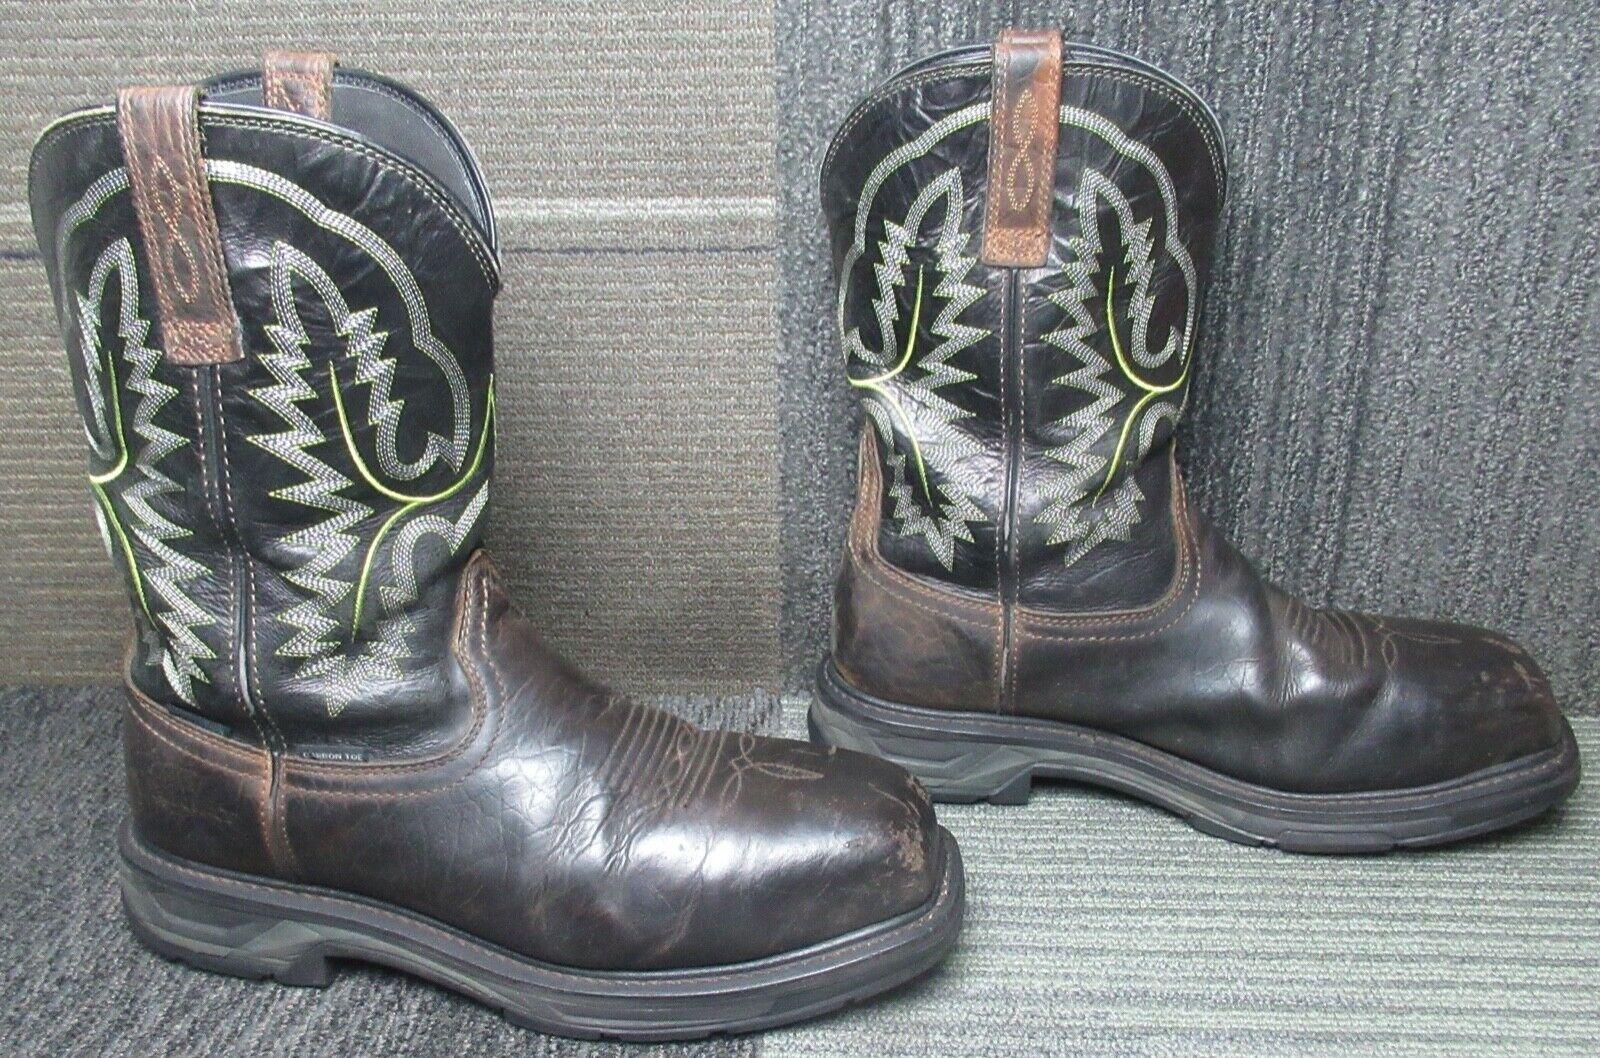 Mens ARIAT Workhog XT Waterproof Carbon Toe Leather Work Boots Sz 11.5 D - $36.00